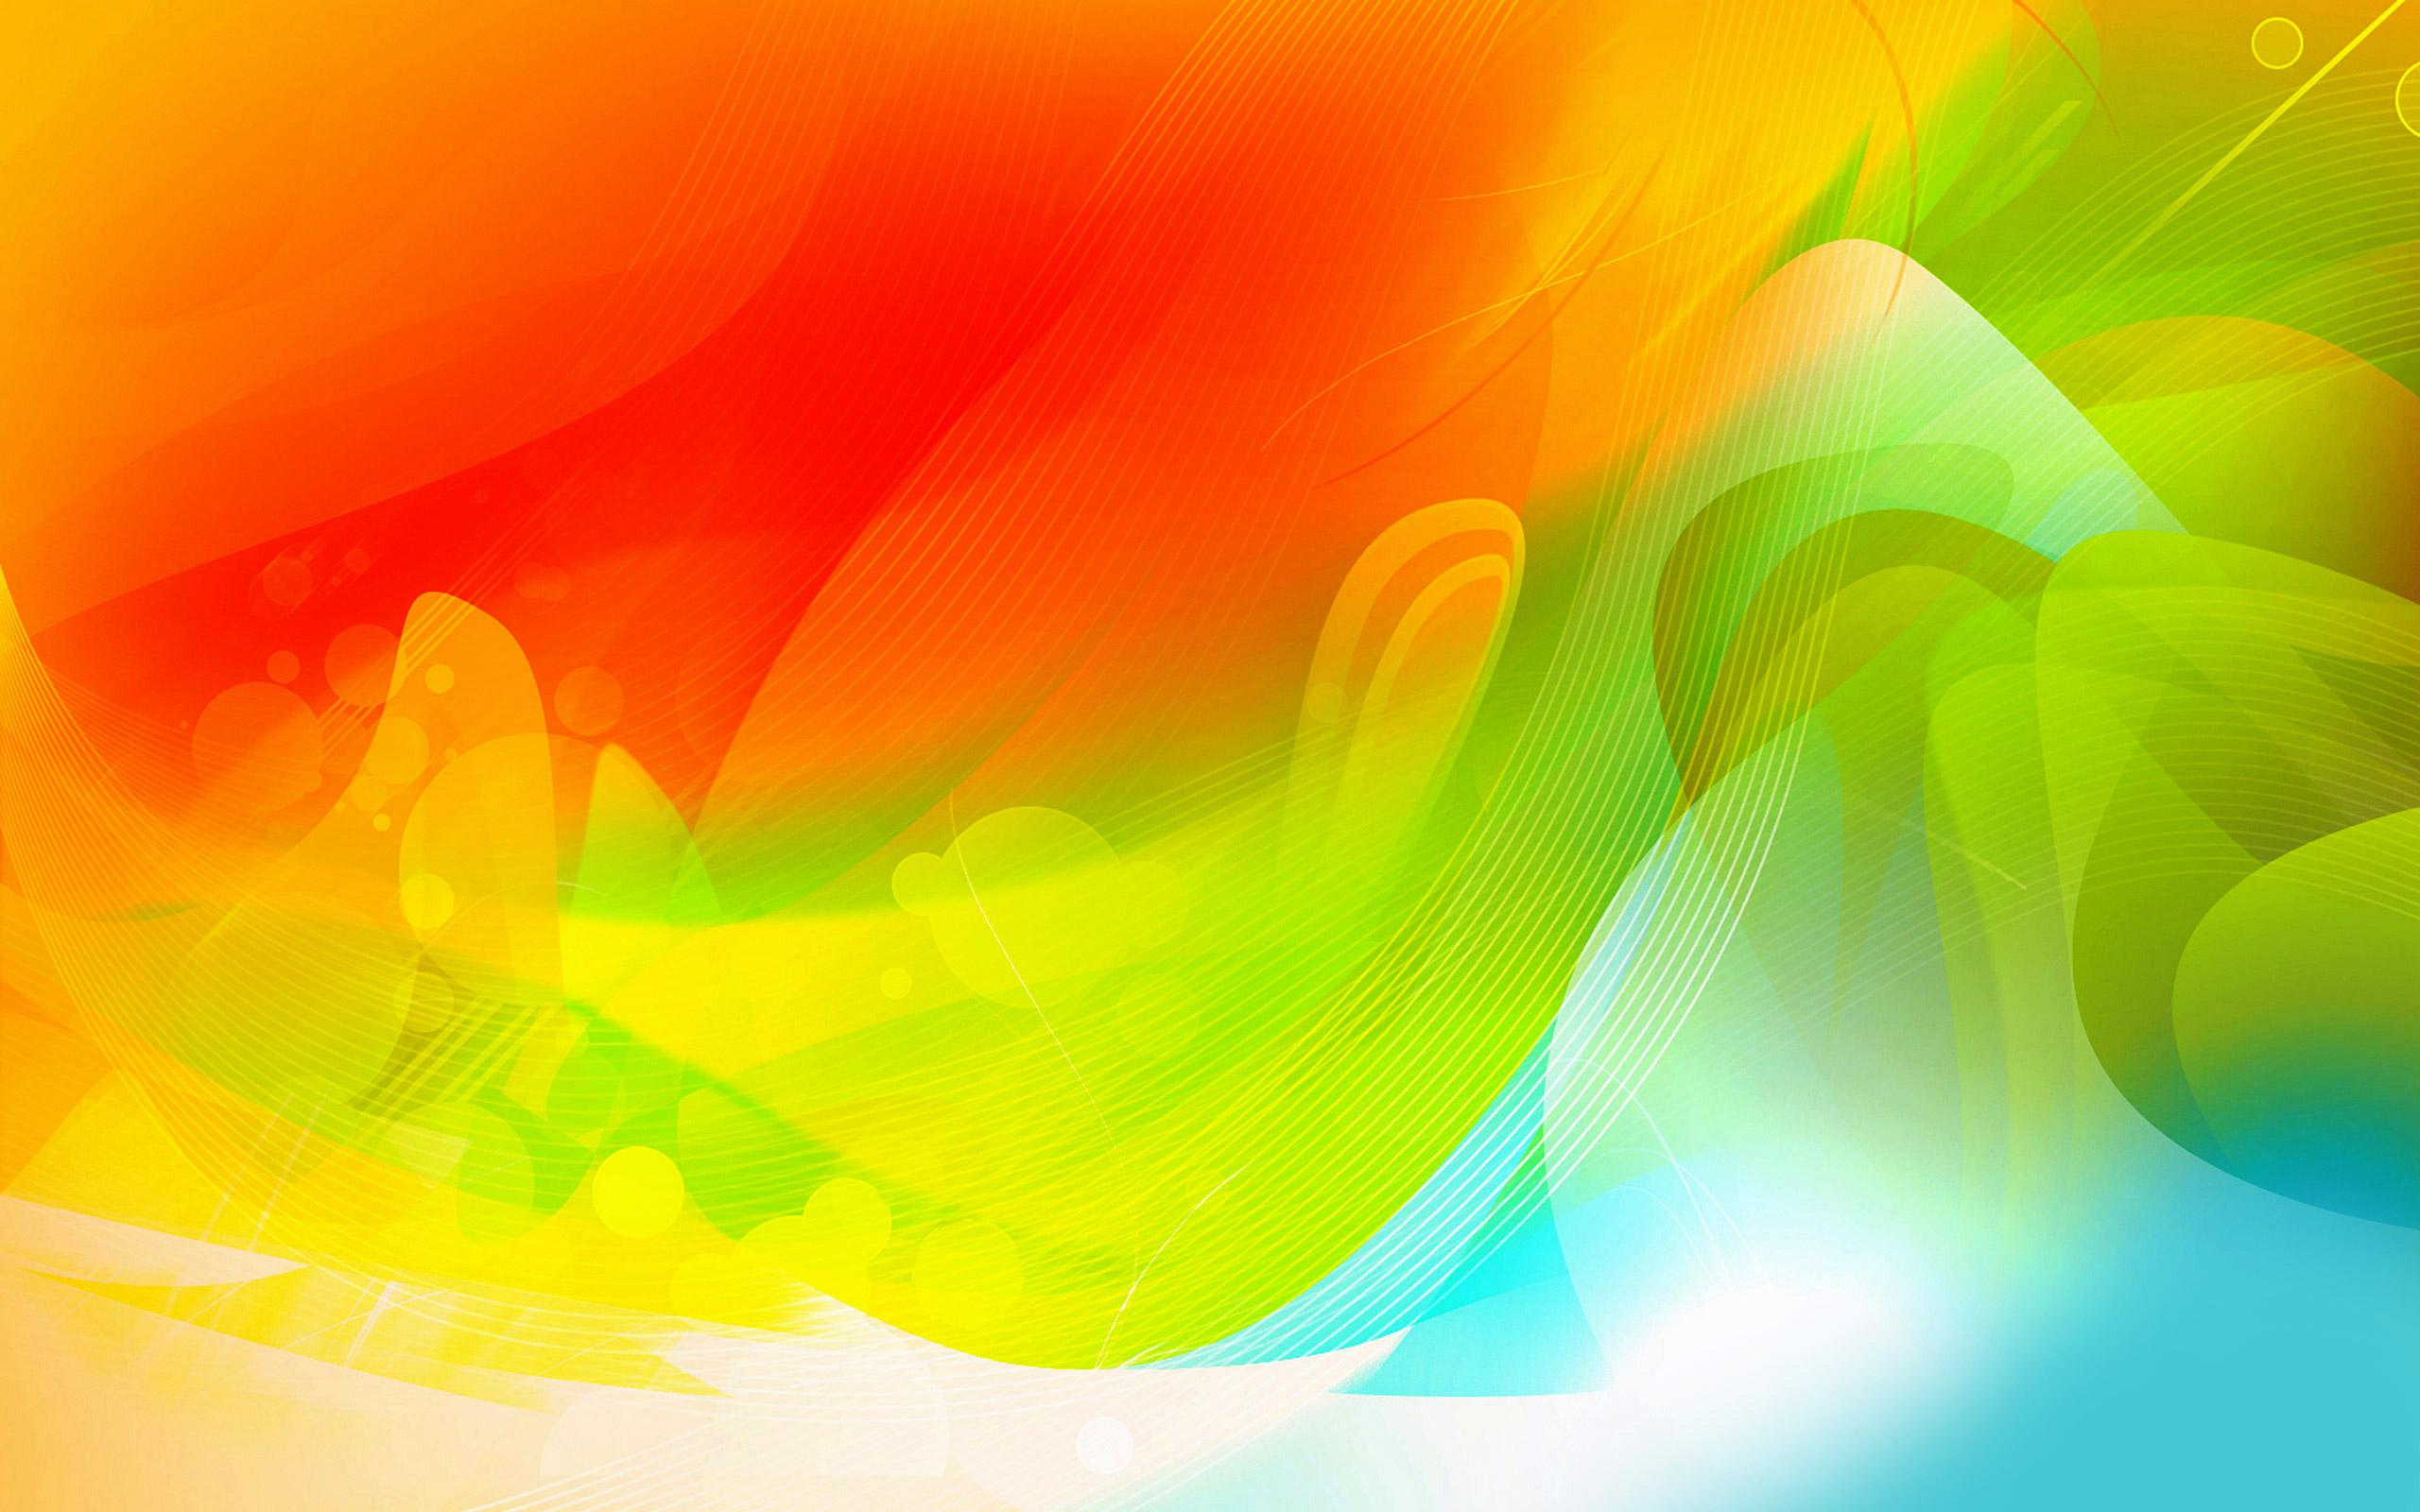 rainbow wallpaper, радйга, краски, скачать фото